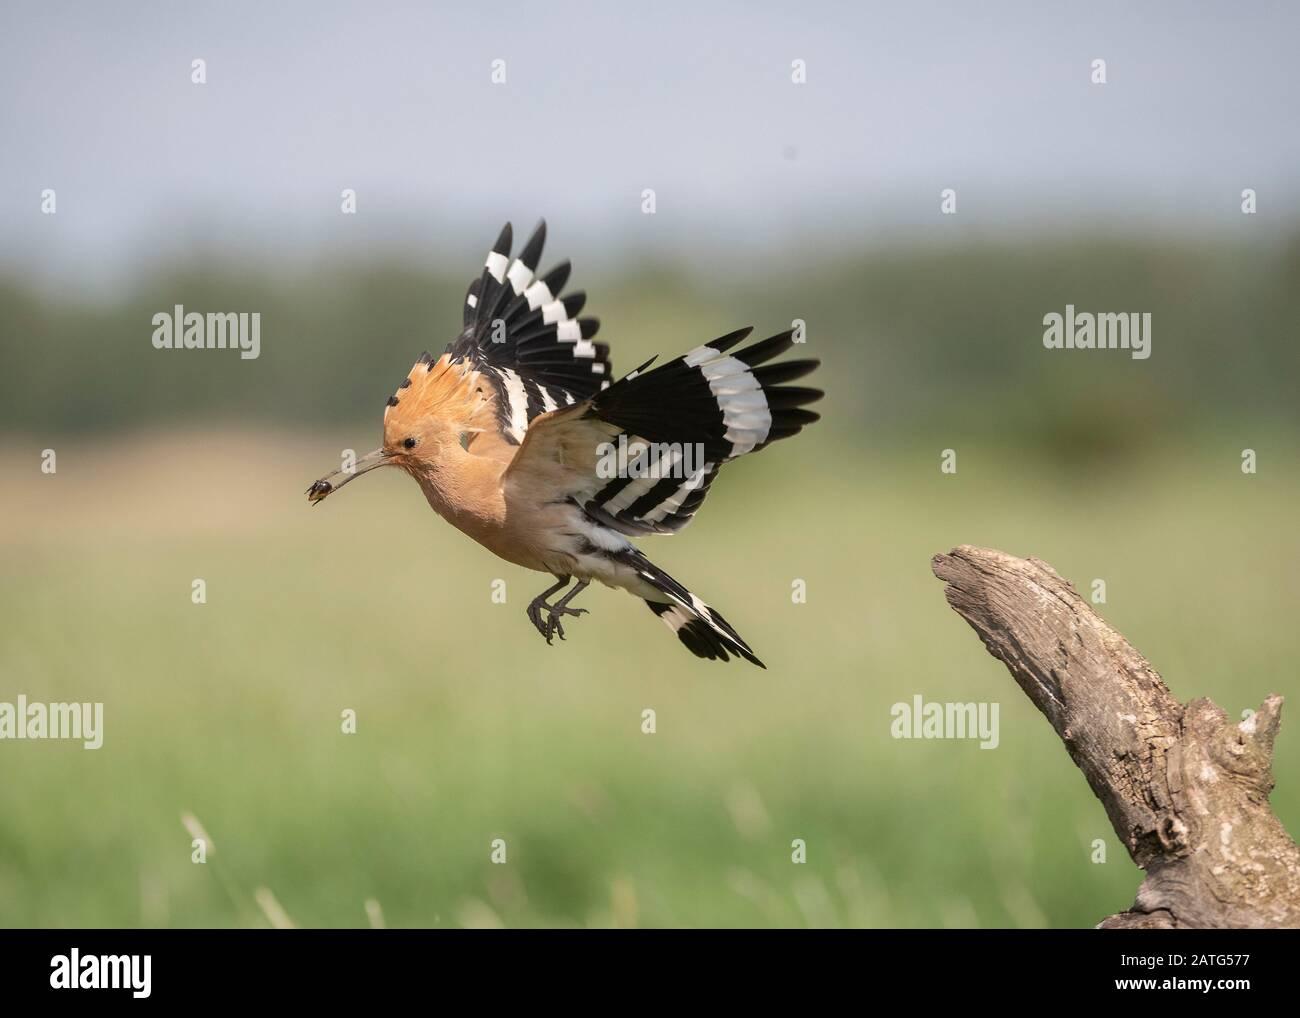 Hoopoe (Upupa epops), in flight with food in its bill, Hortobágy National Park, Hungary Stock Photo